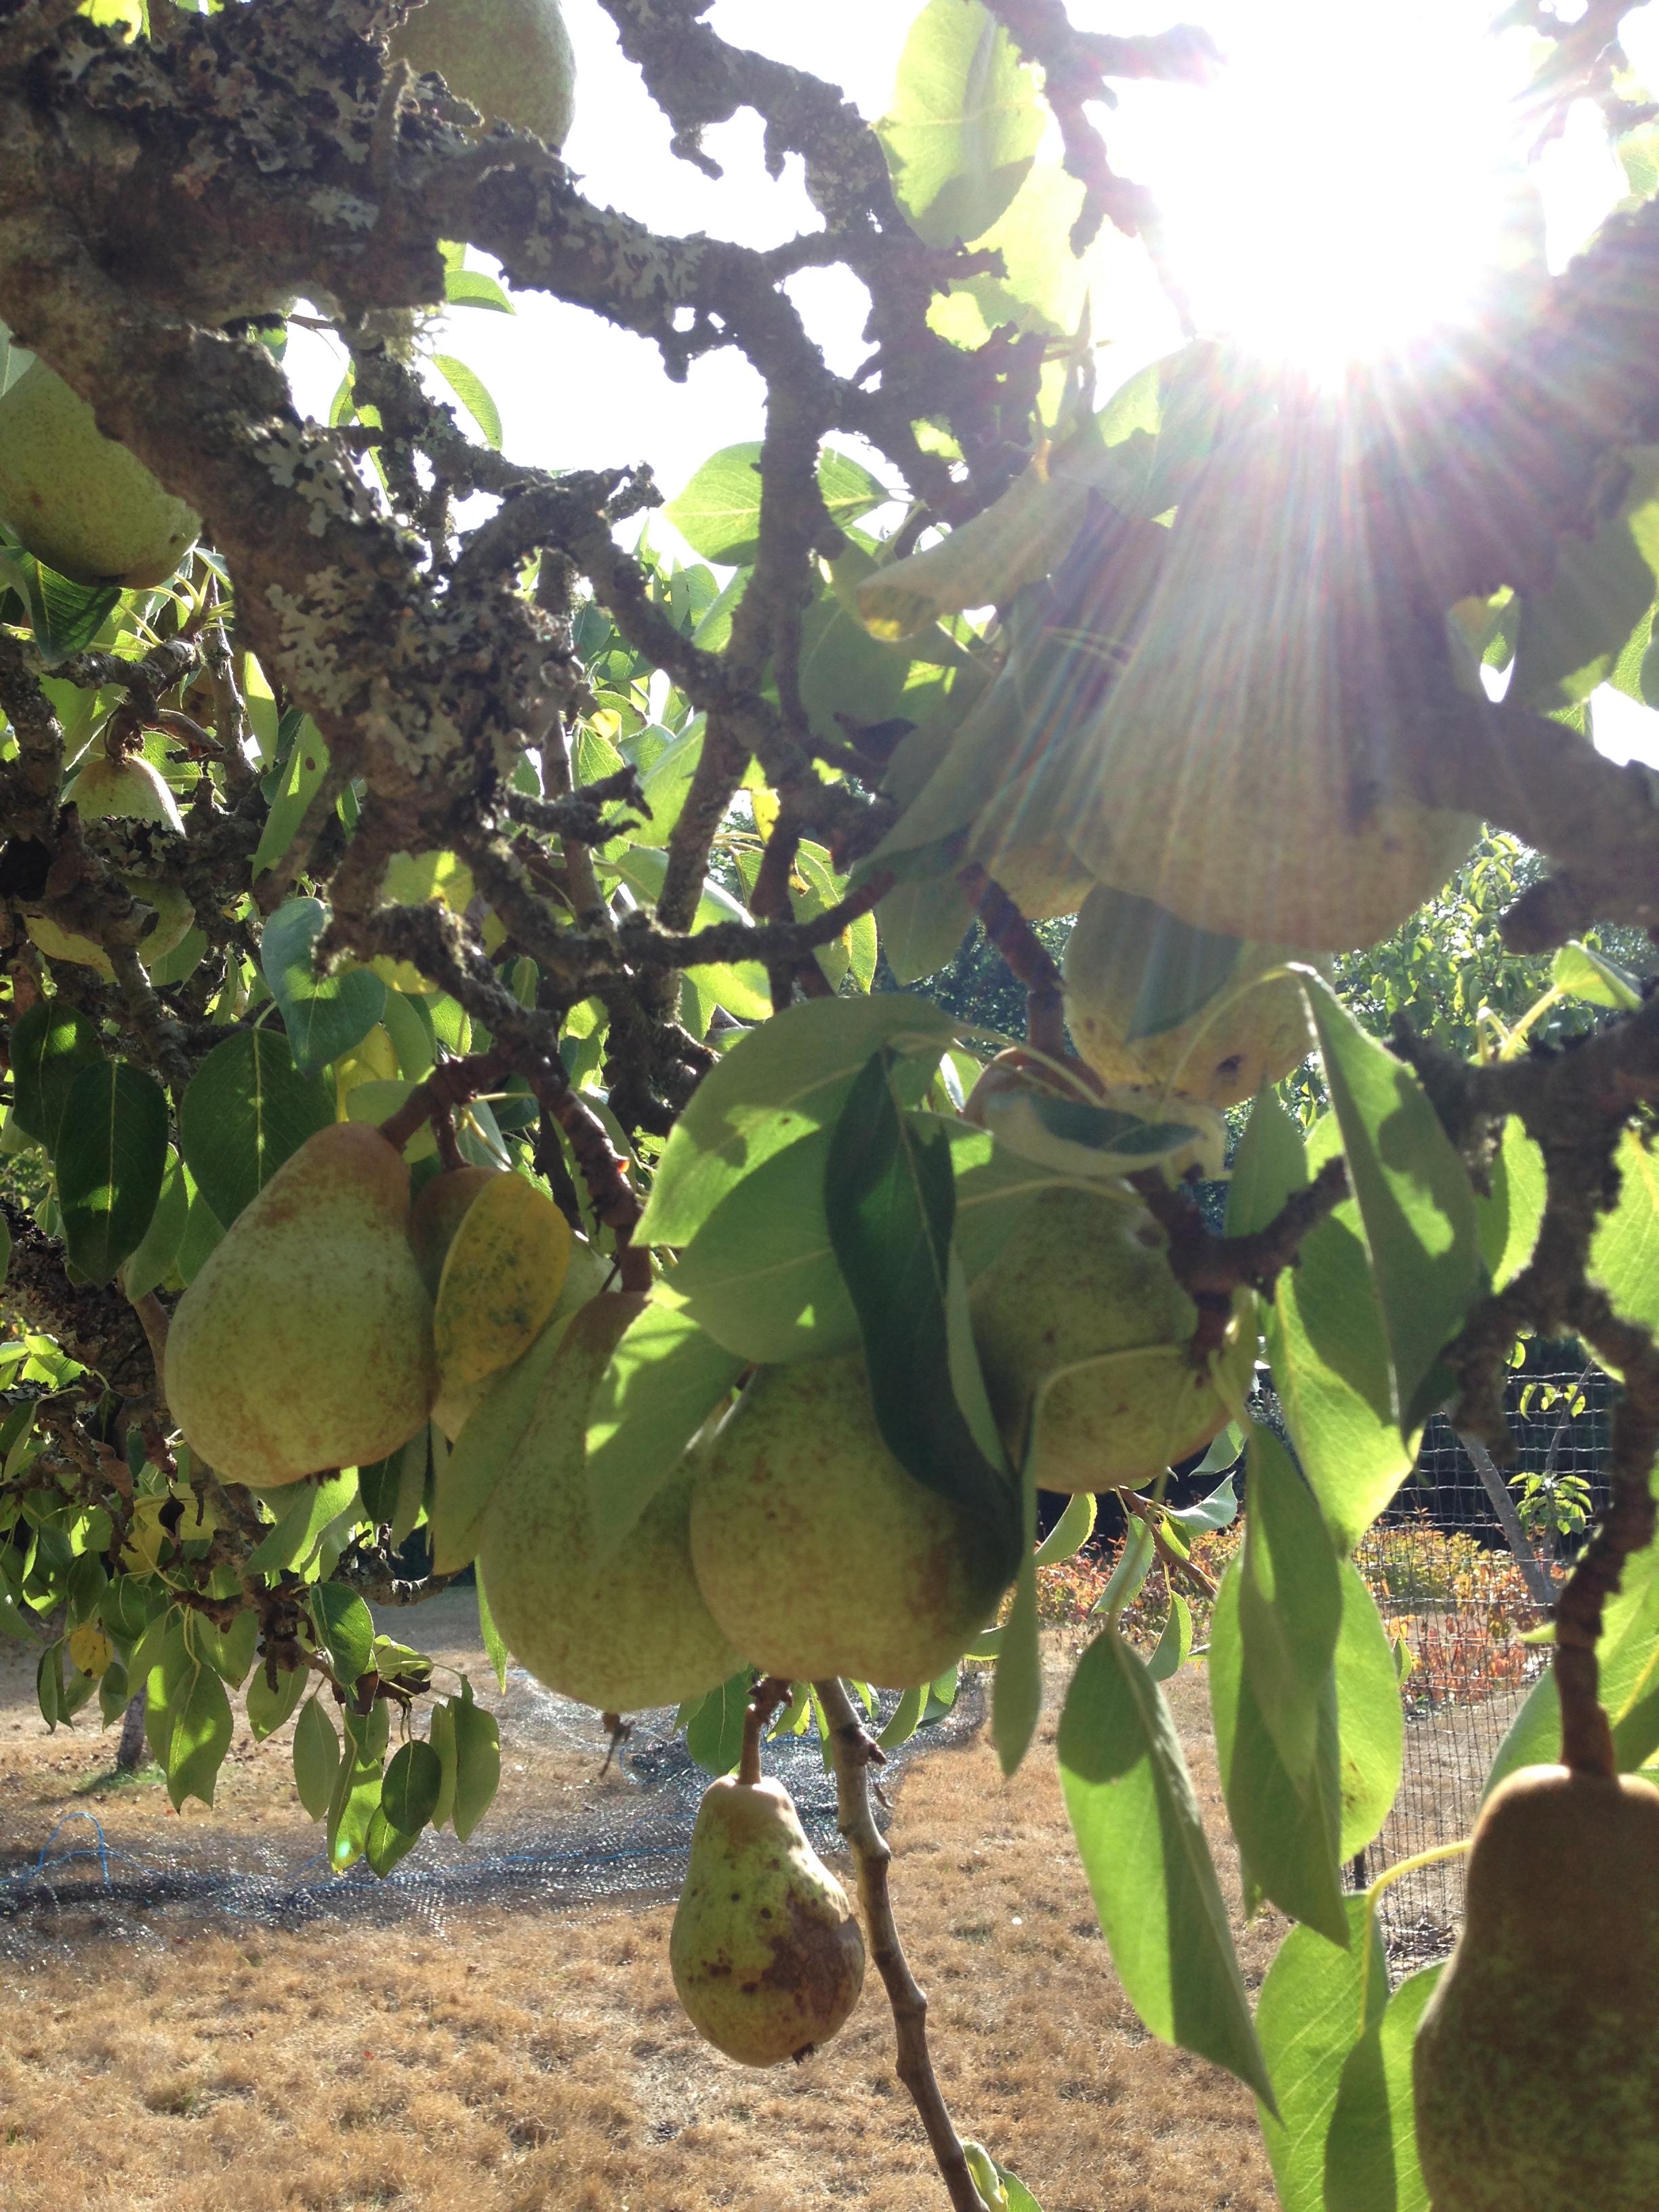 pears on trees.jpg